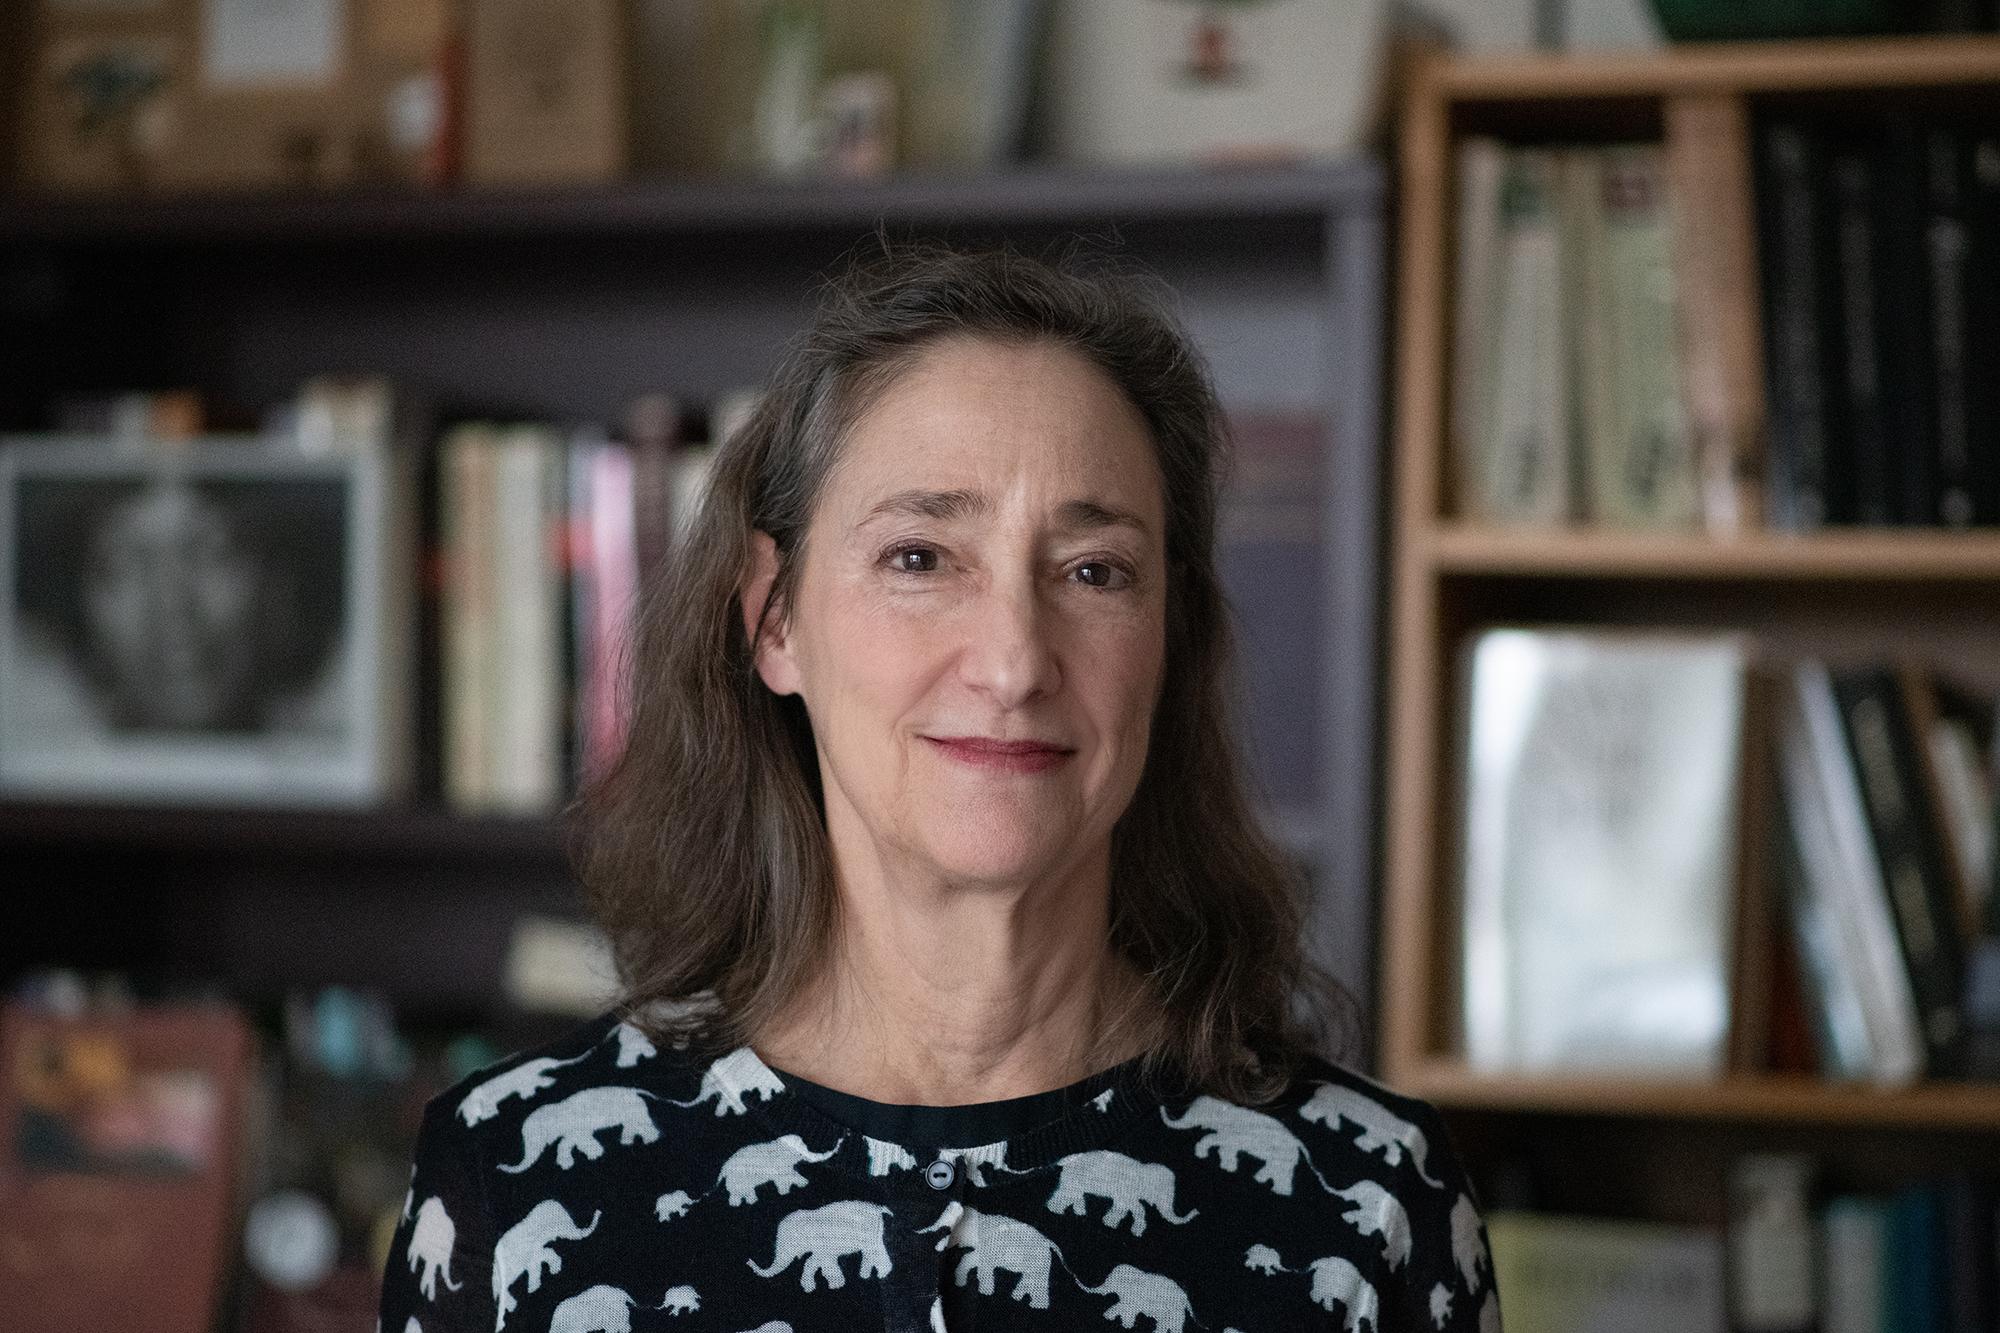 Poet and Saint Rose professor Barbara Ungar